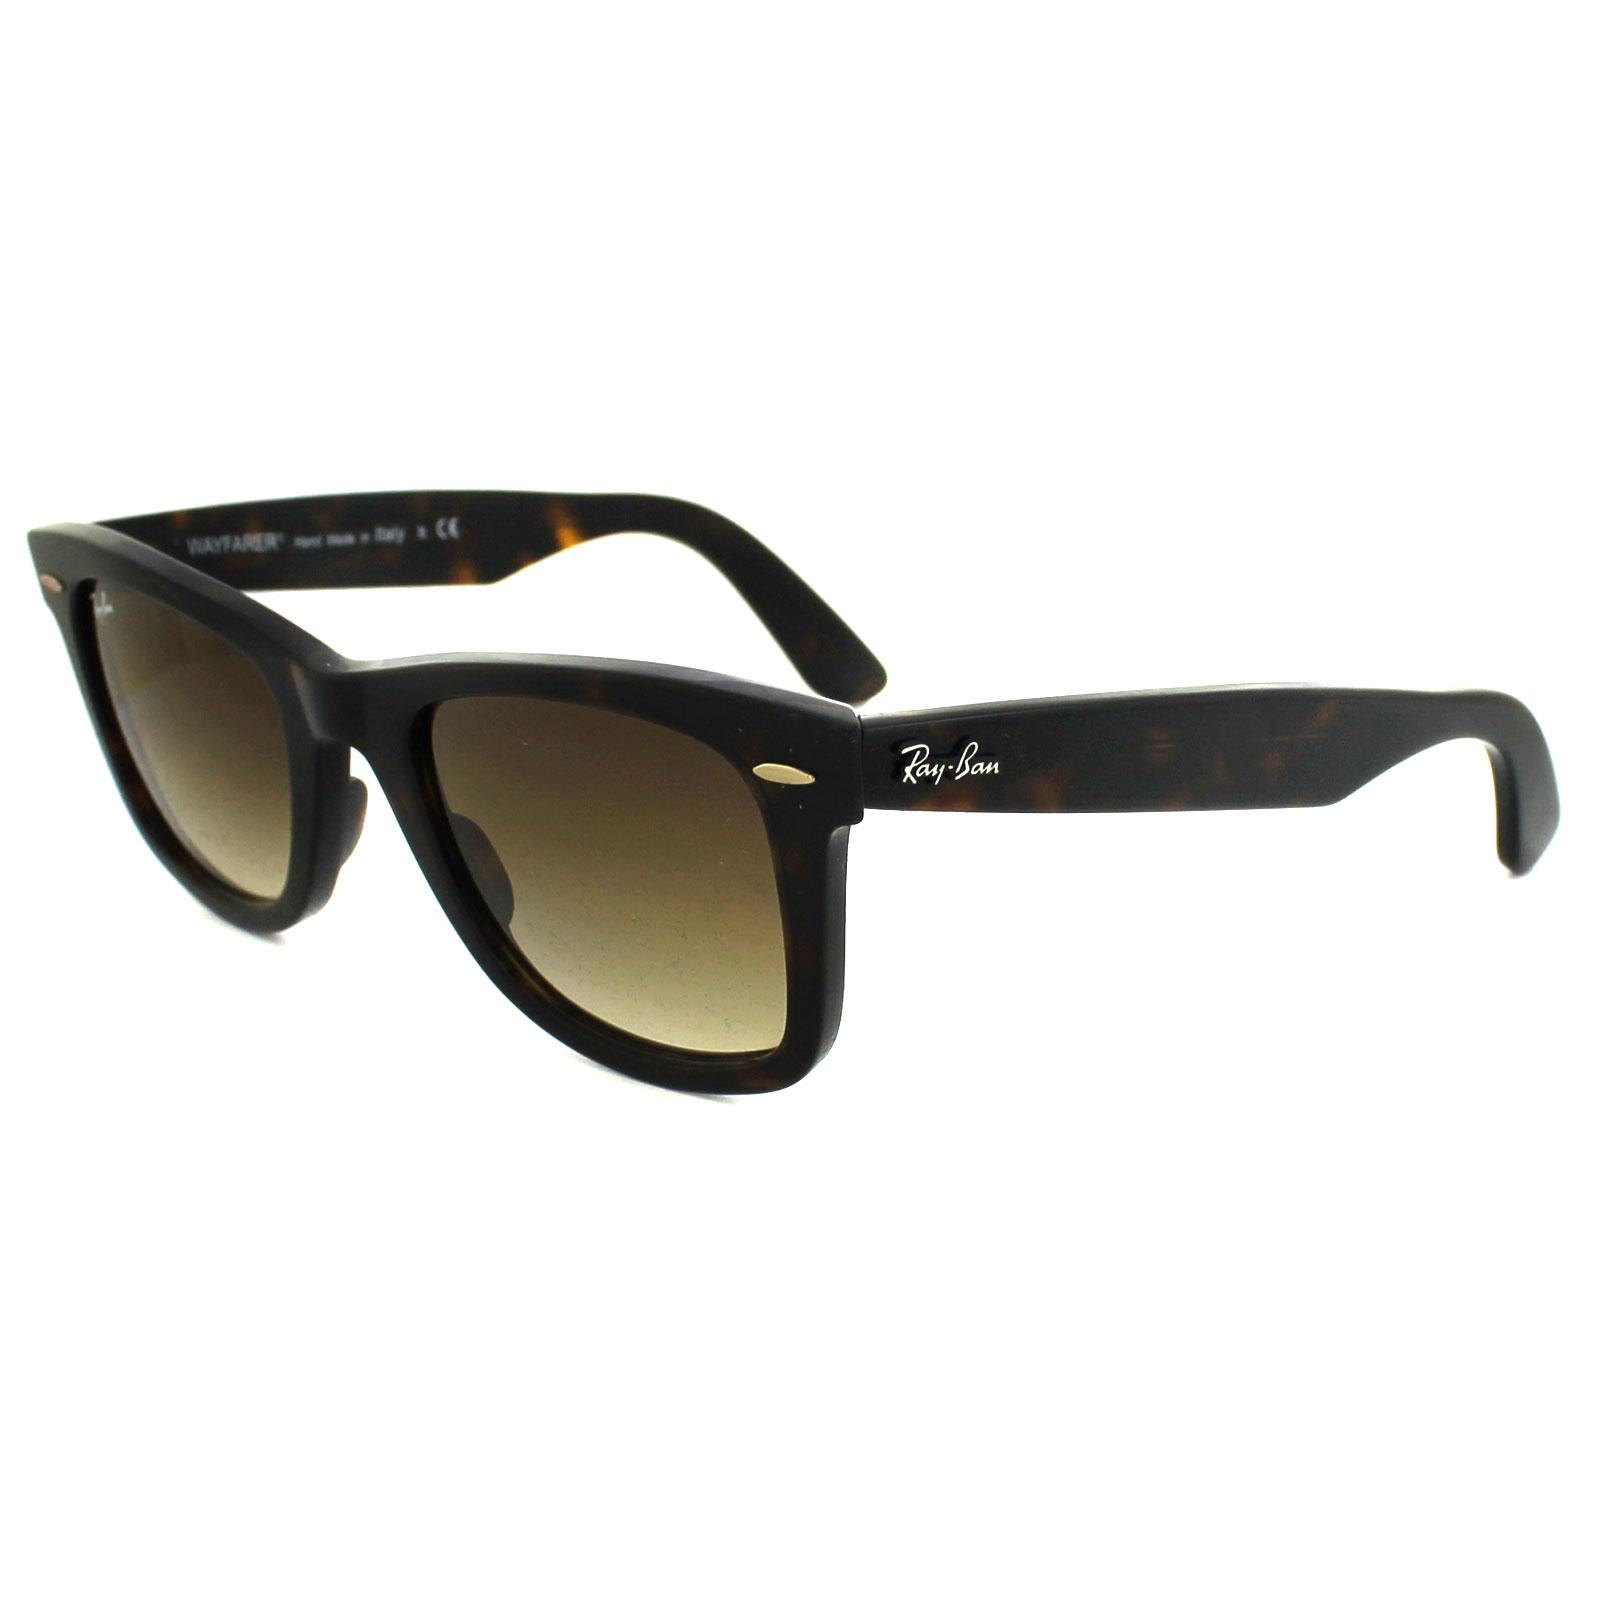 5af75c28069f1 Sentinel Ray-Ban Sunglasses Wayfarer 2140 902 51 Havana Brown Gradient  Medium 50mm